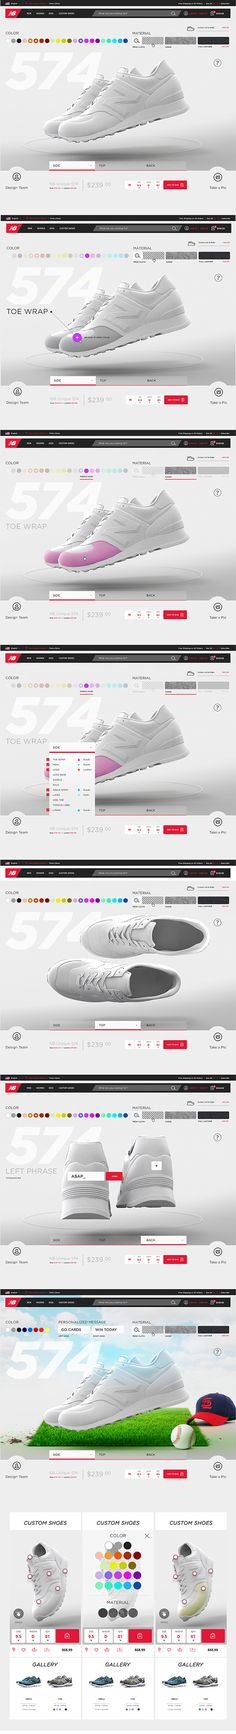 New Balance on Web Design Served